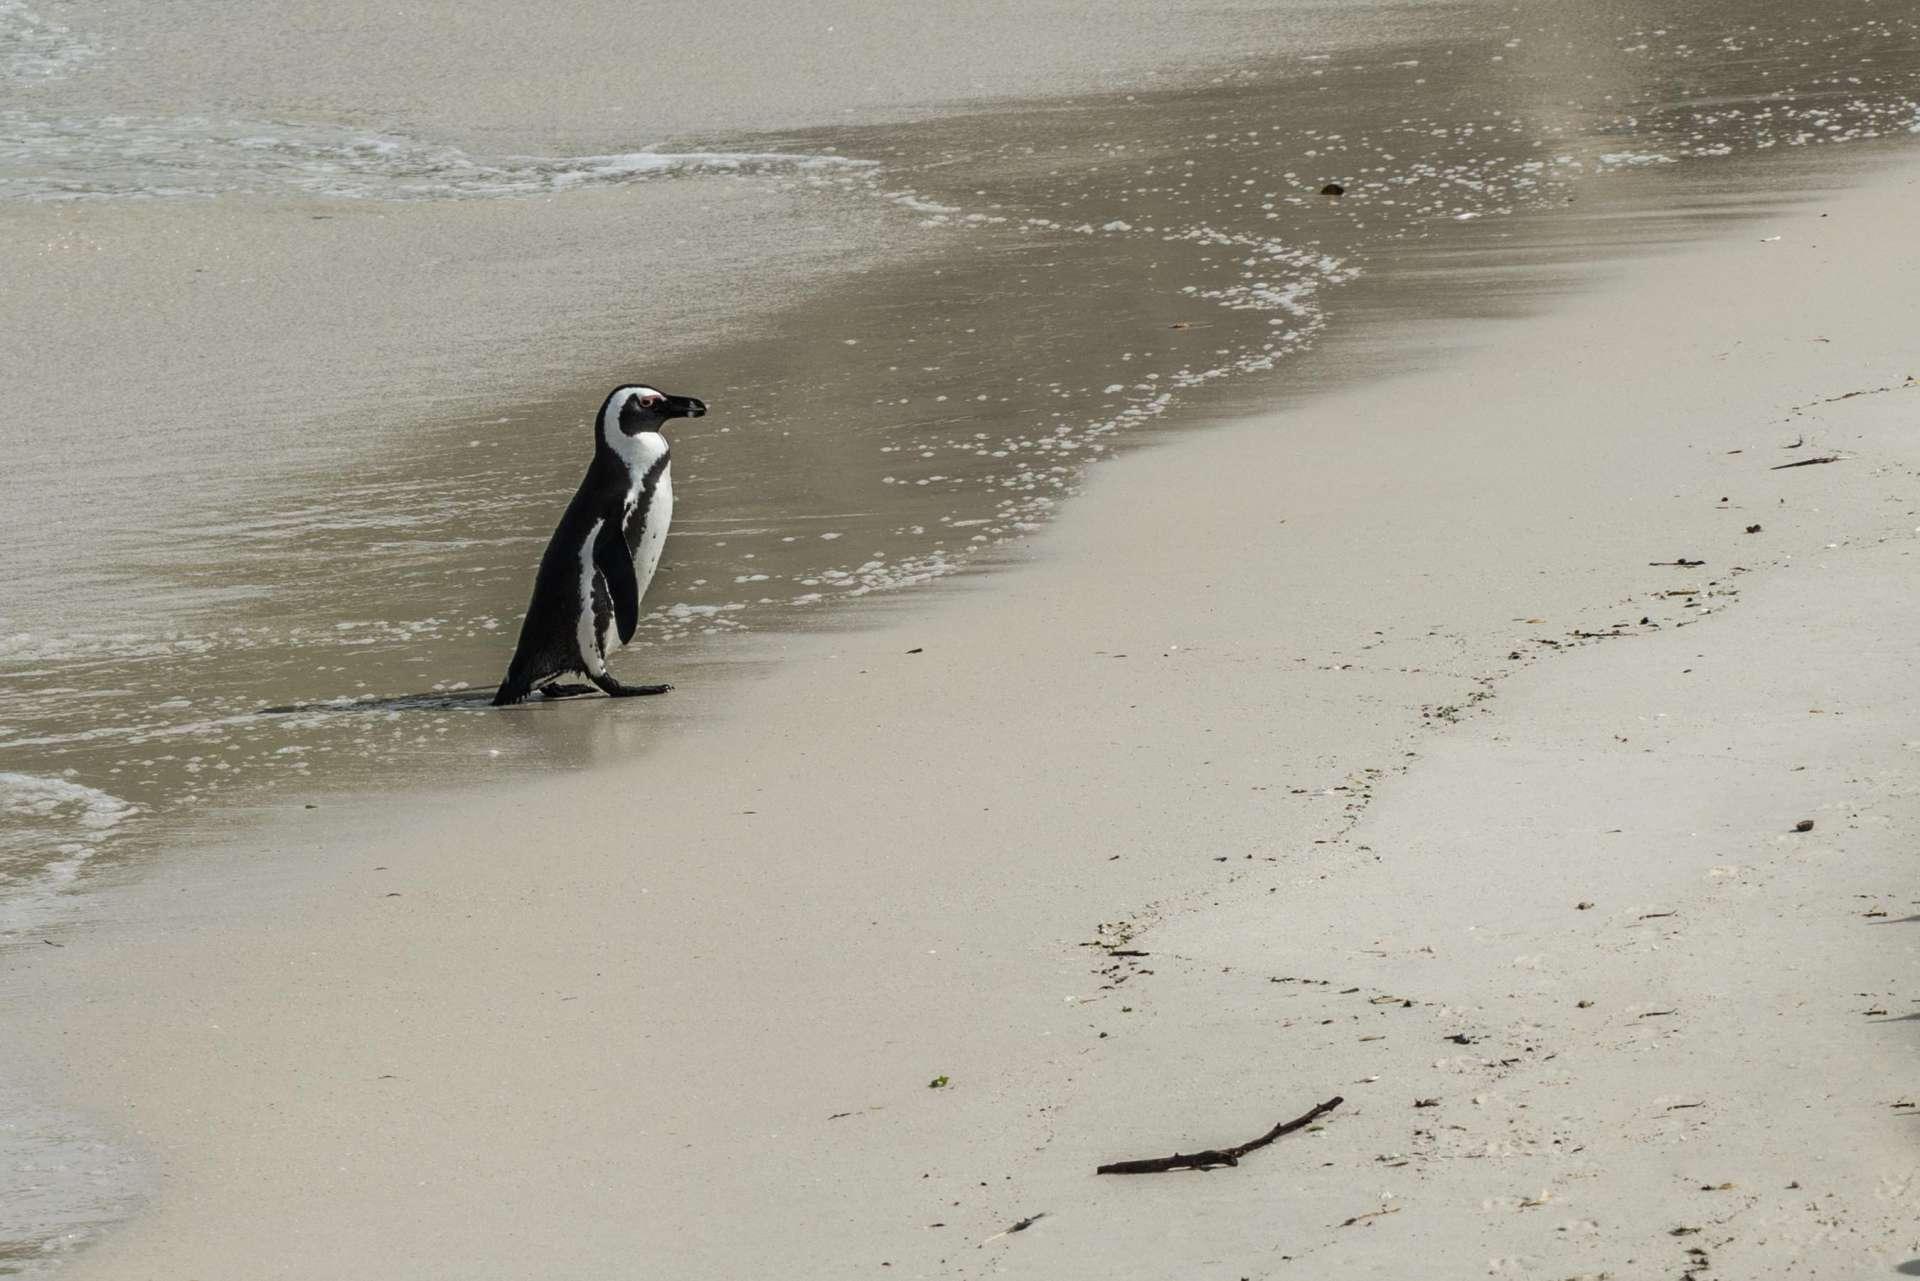 Cape Town Boulders Beach Pescart Enrico Pescantini 5